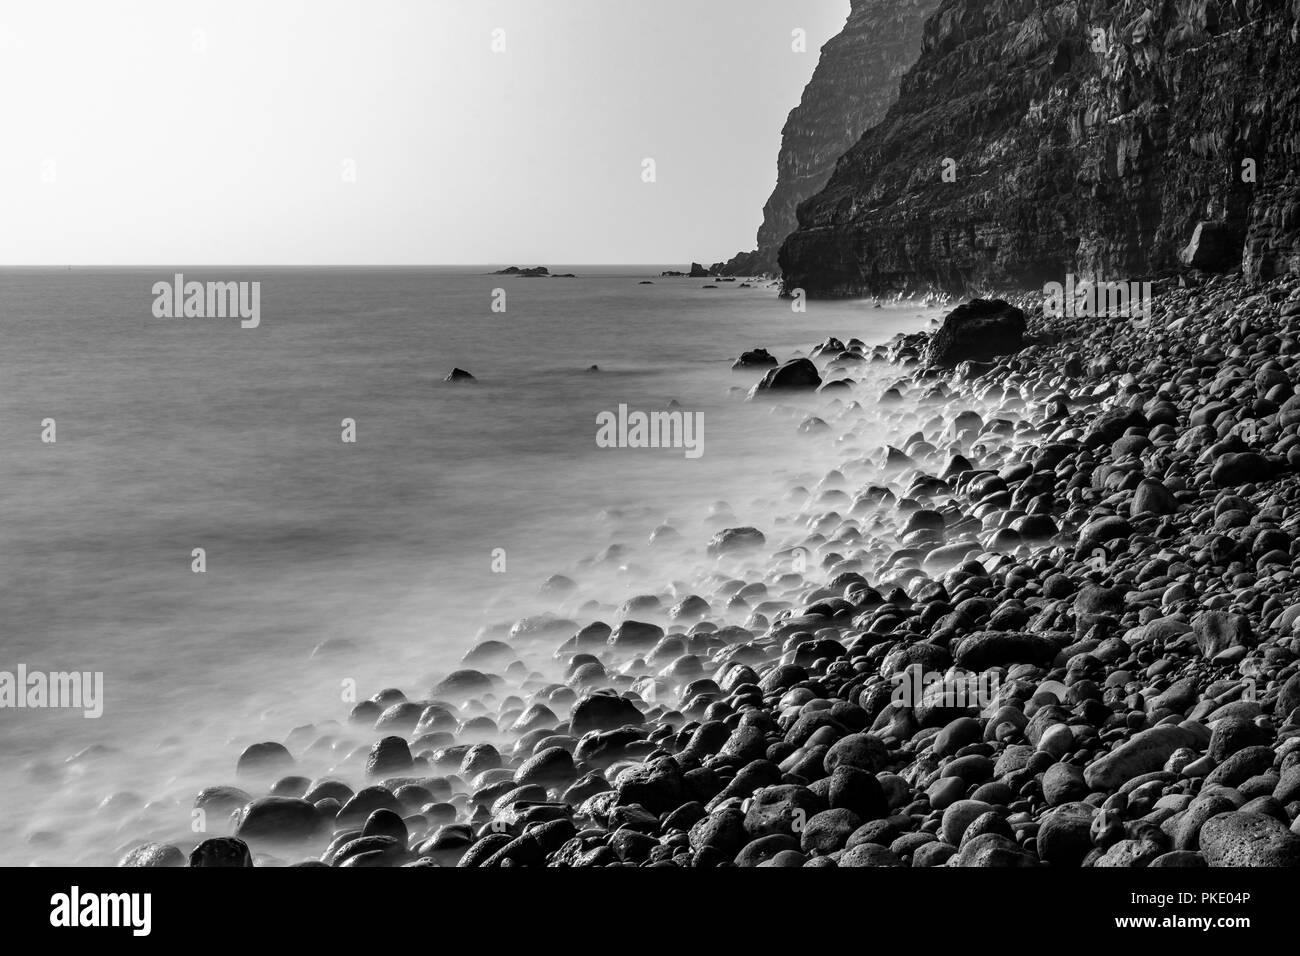 lava stone beach - Stock Image